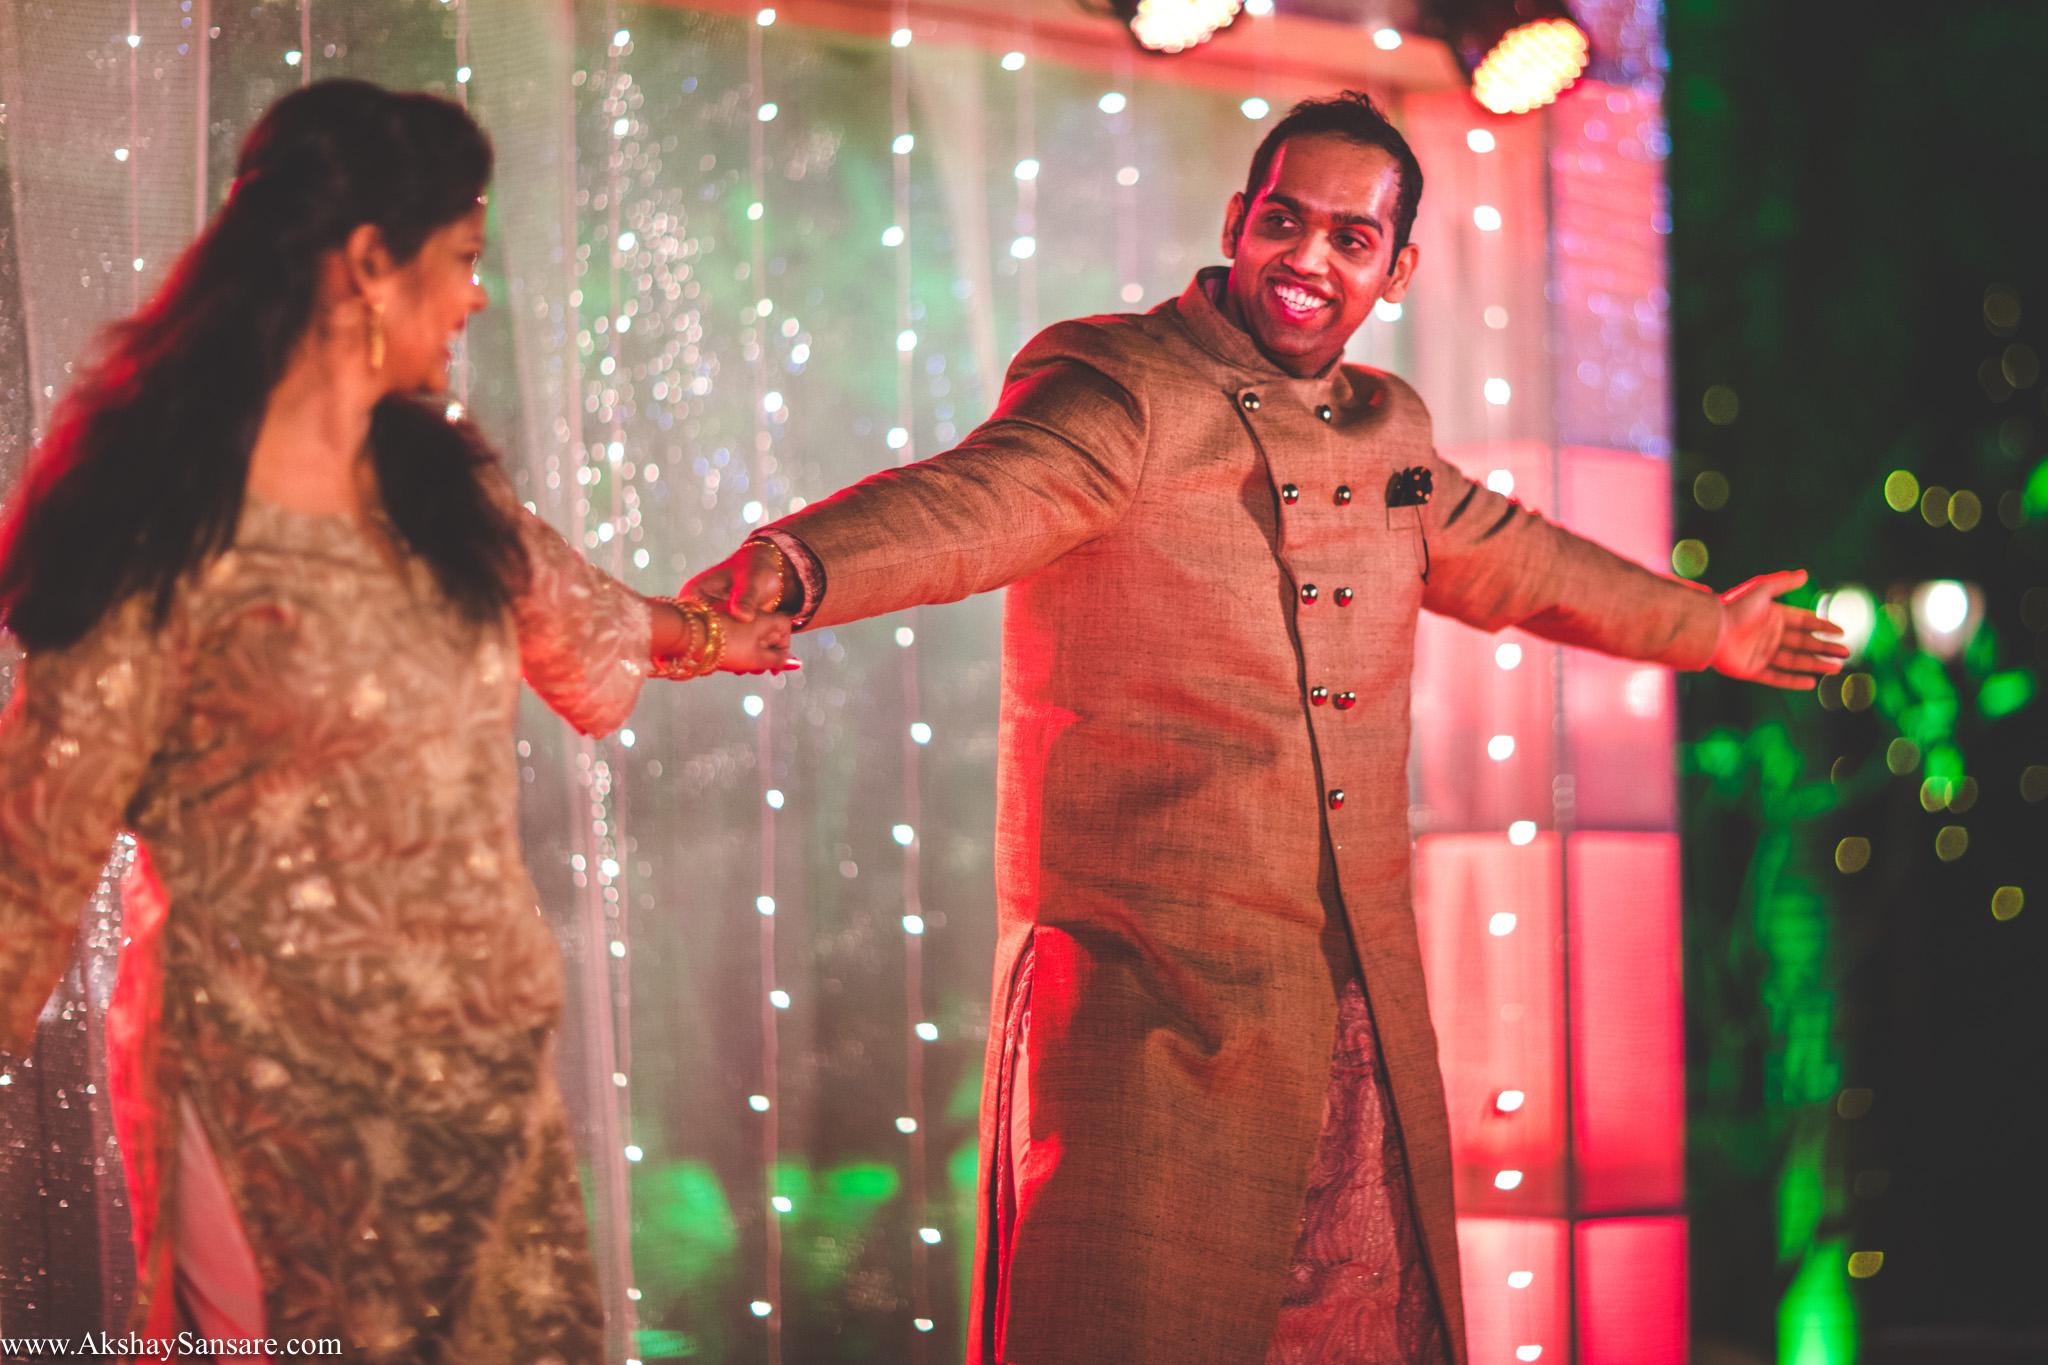 Salil x Kimaya Akshay Sansare Photography Candid wedding Photographer in mumbai best(5).jpg